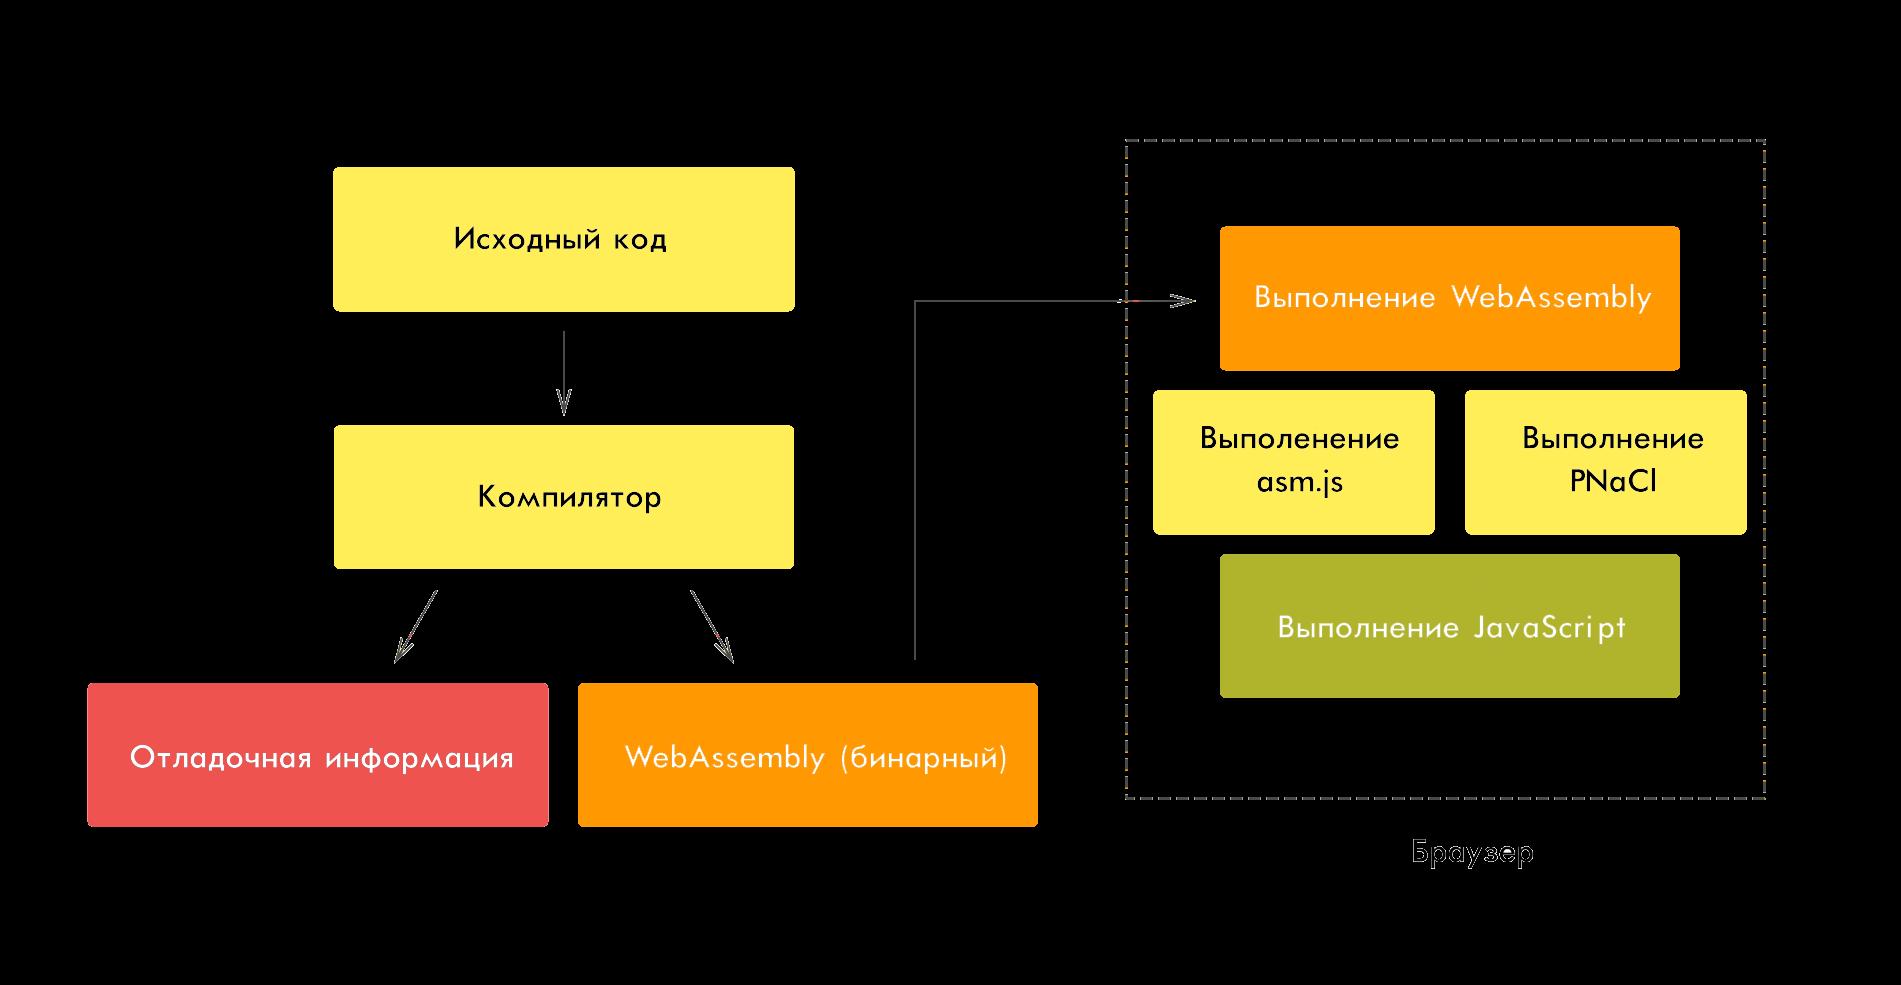 Процесс компиляции webassembly